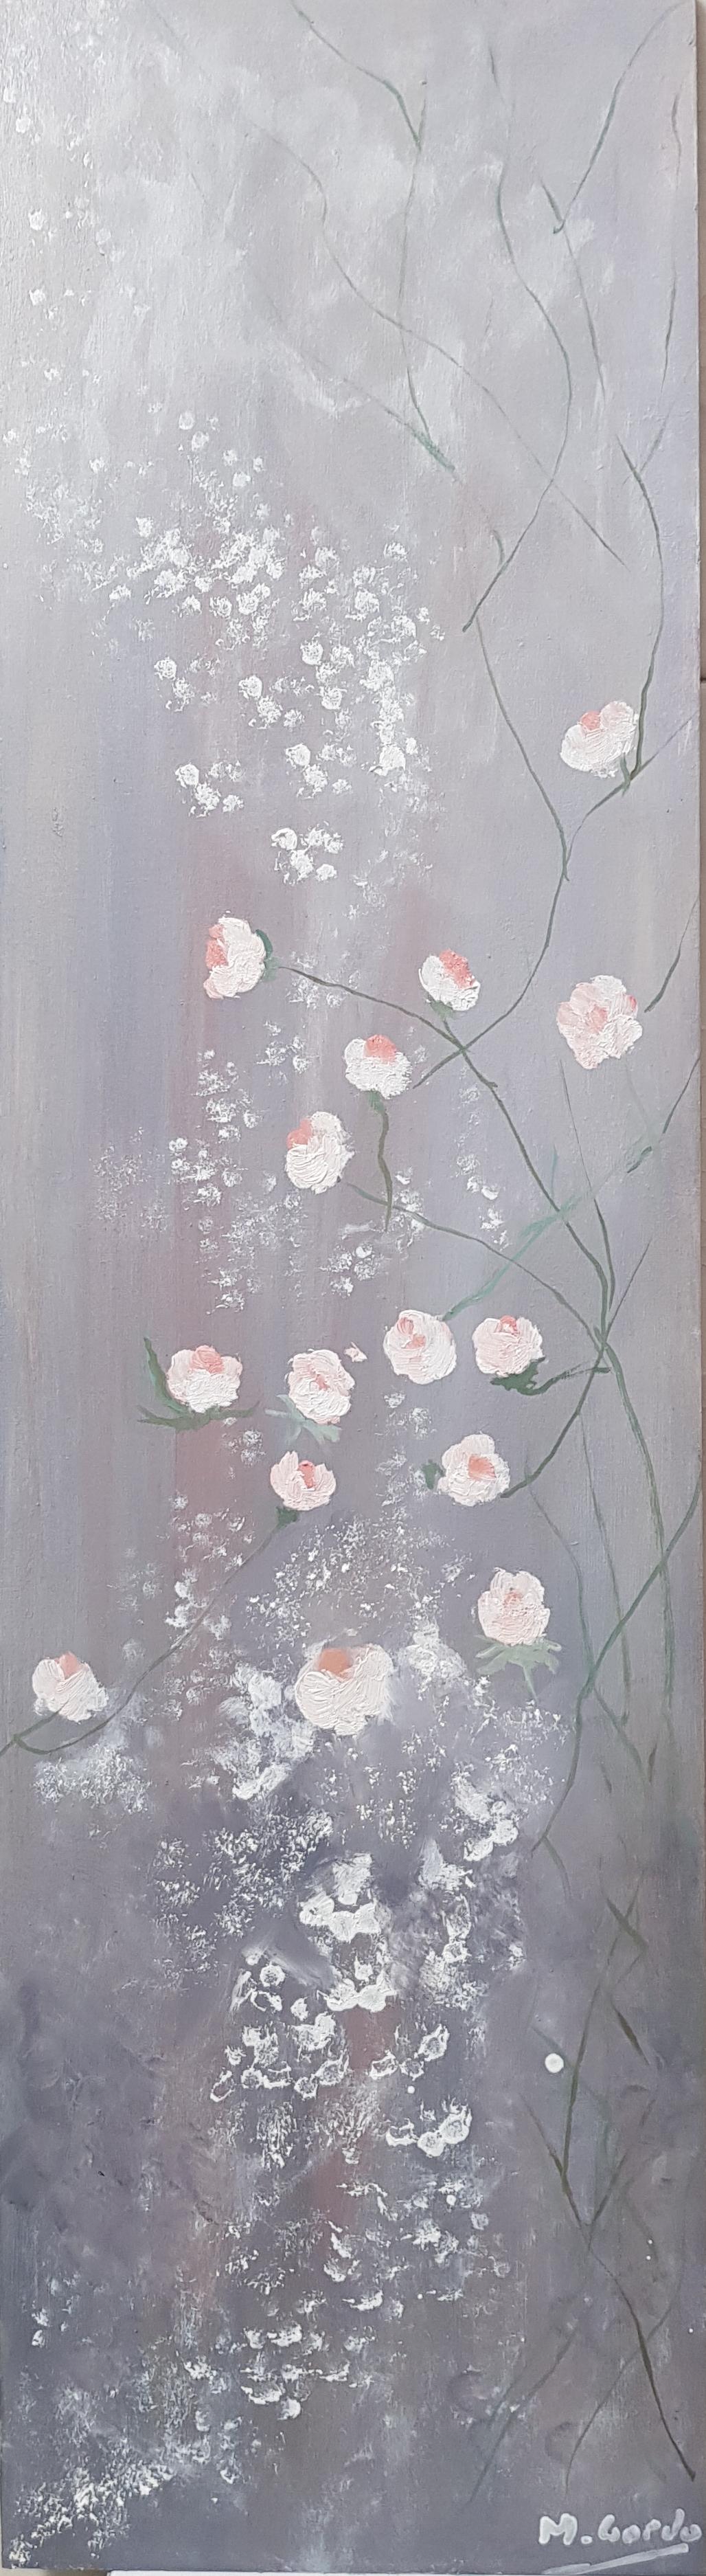 Flores. 4 rosas